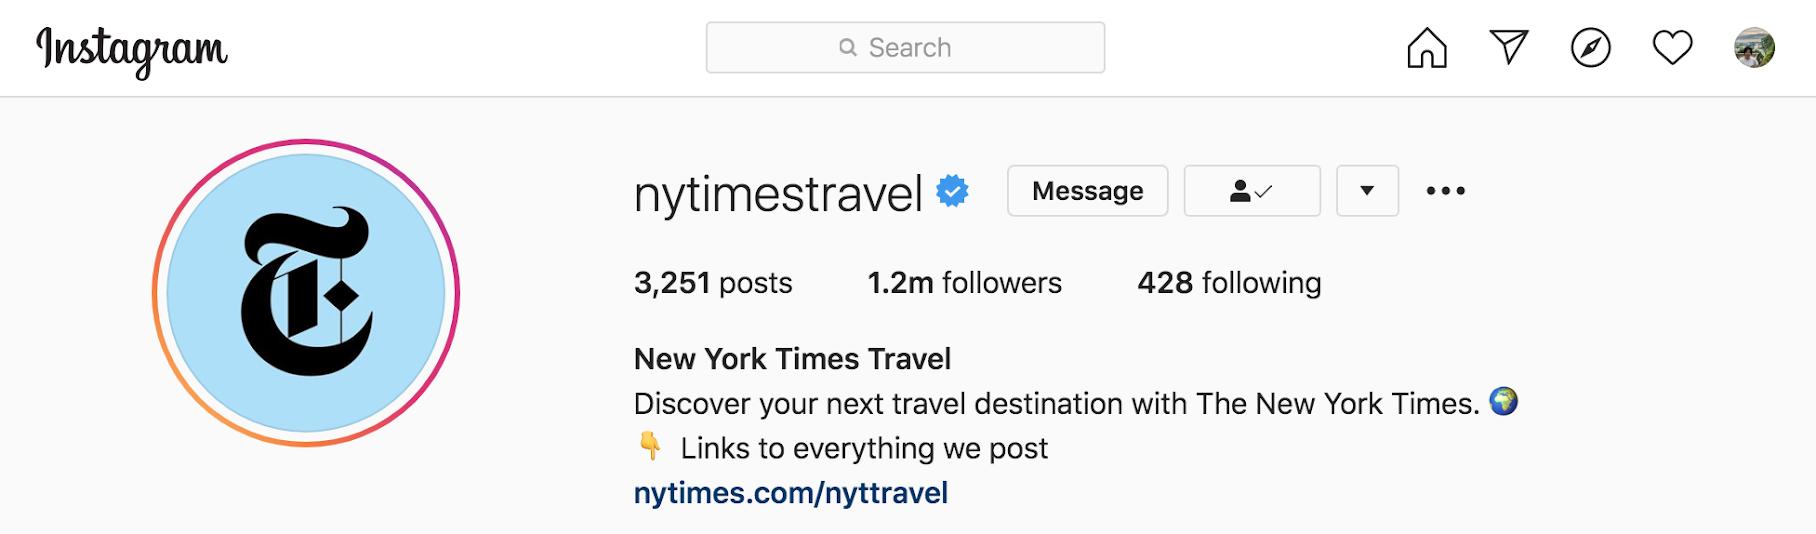 Instagram Direct is now on desktop interface